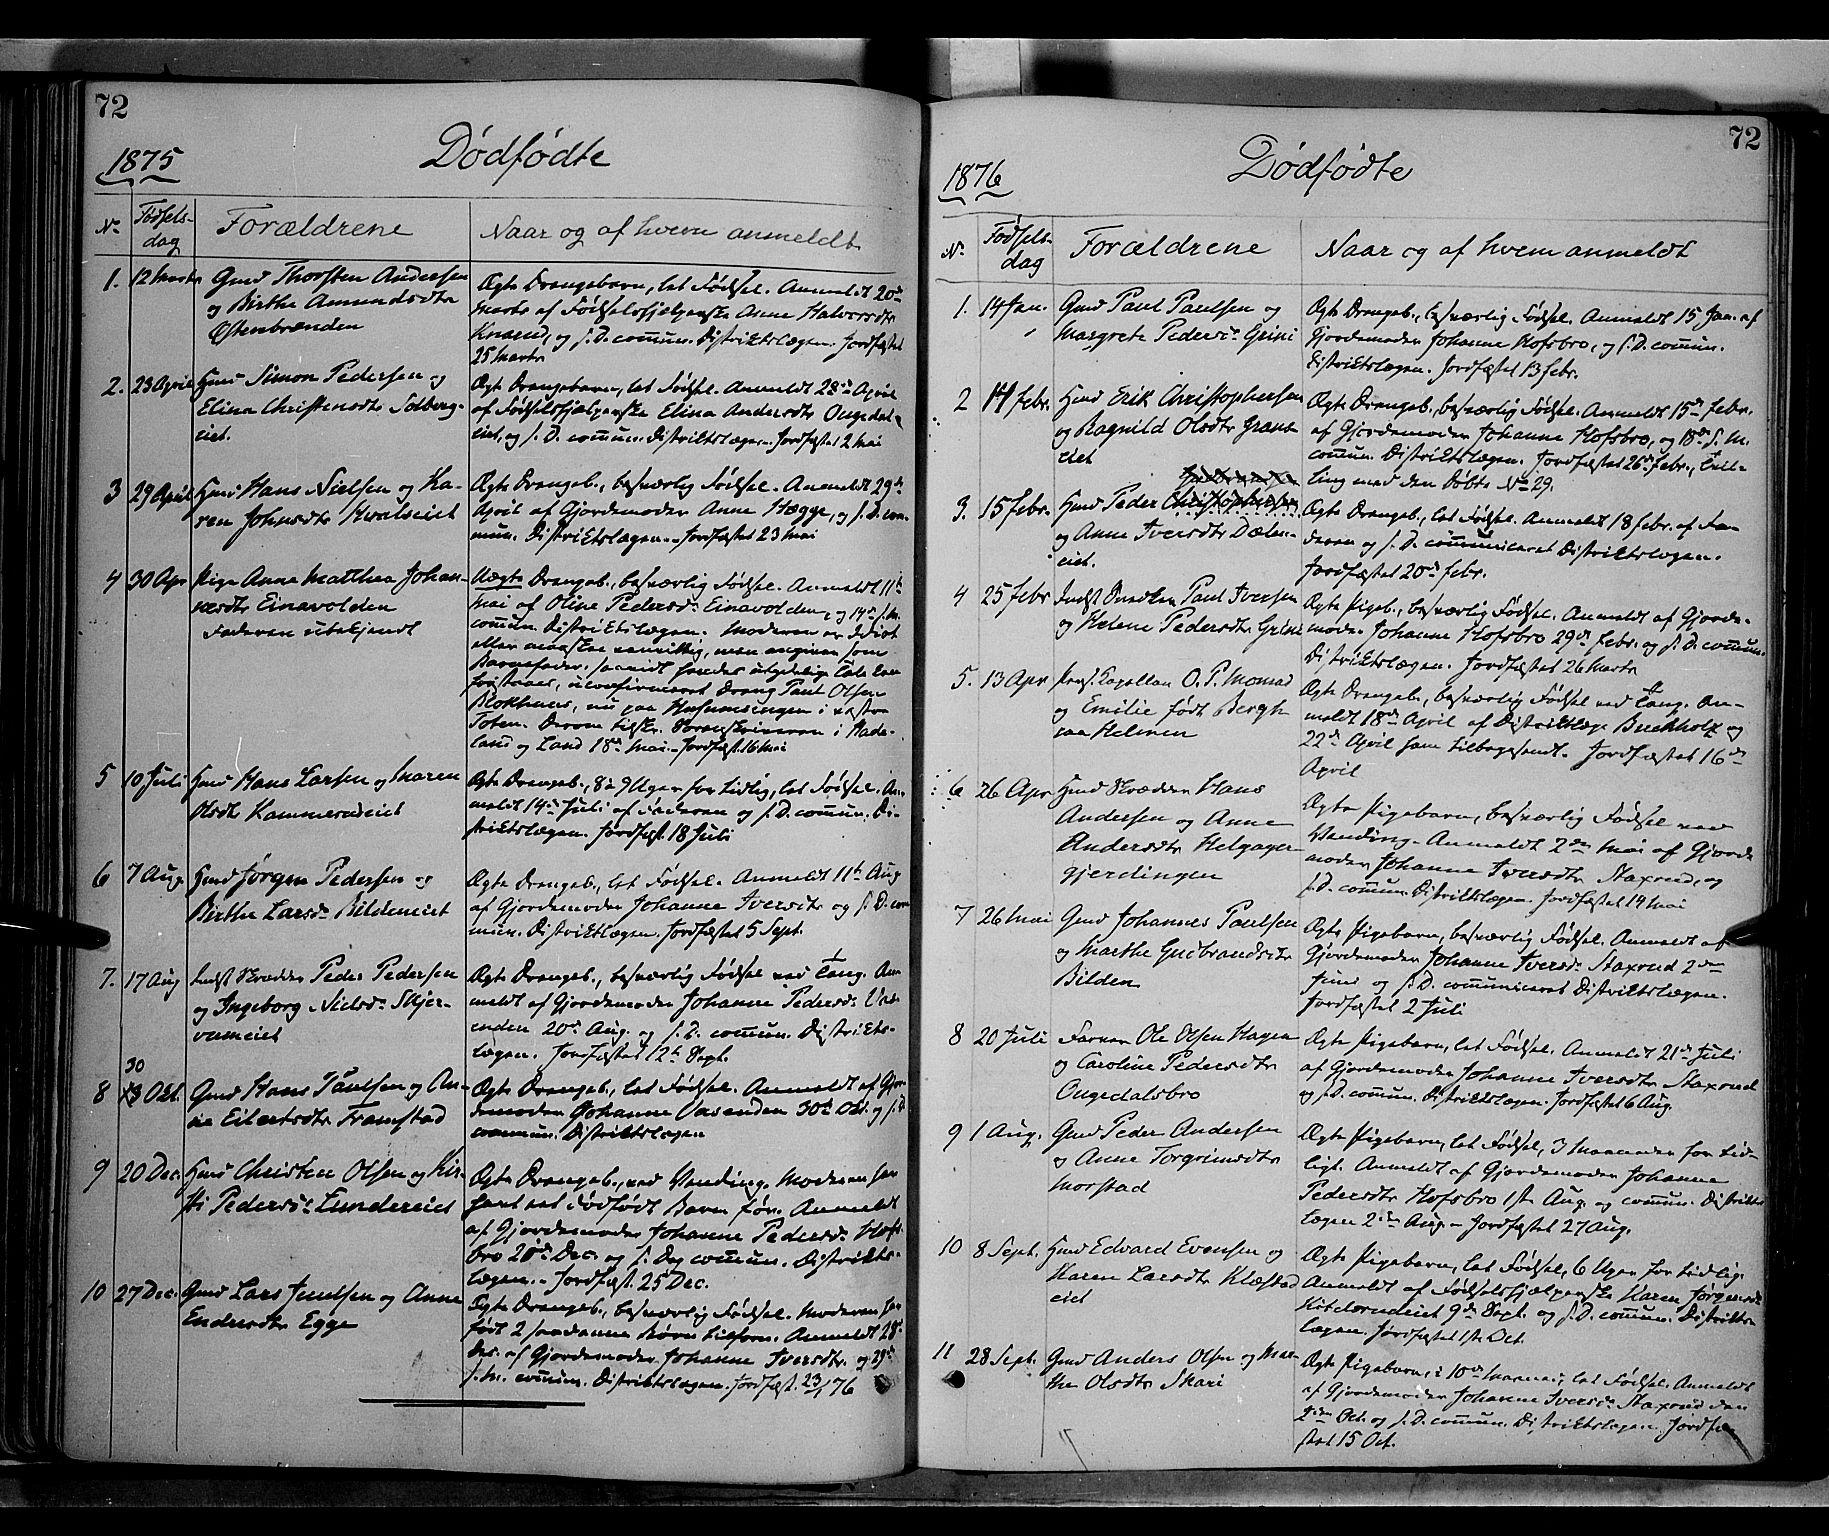 SAH, Gran prestekontor, Ministerialbok nr. 13, 1875-1879, s. 72